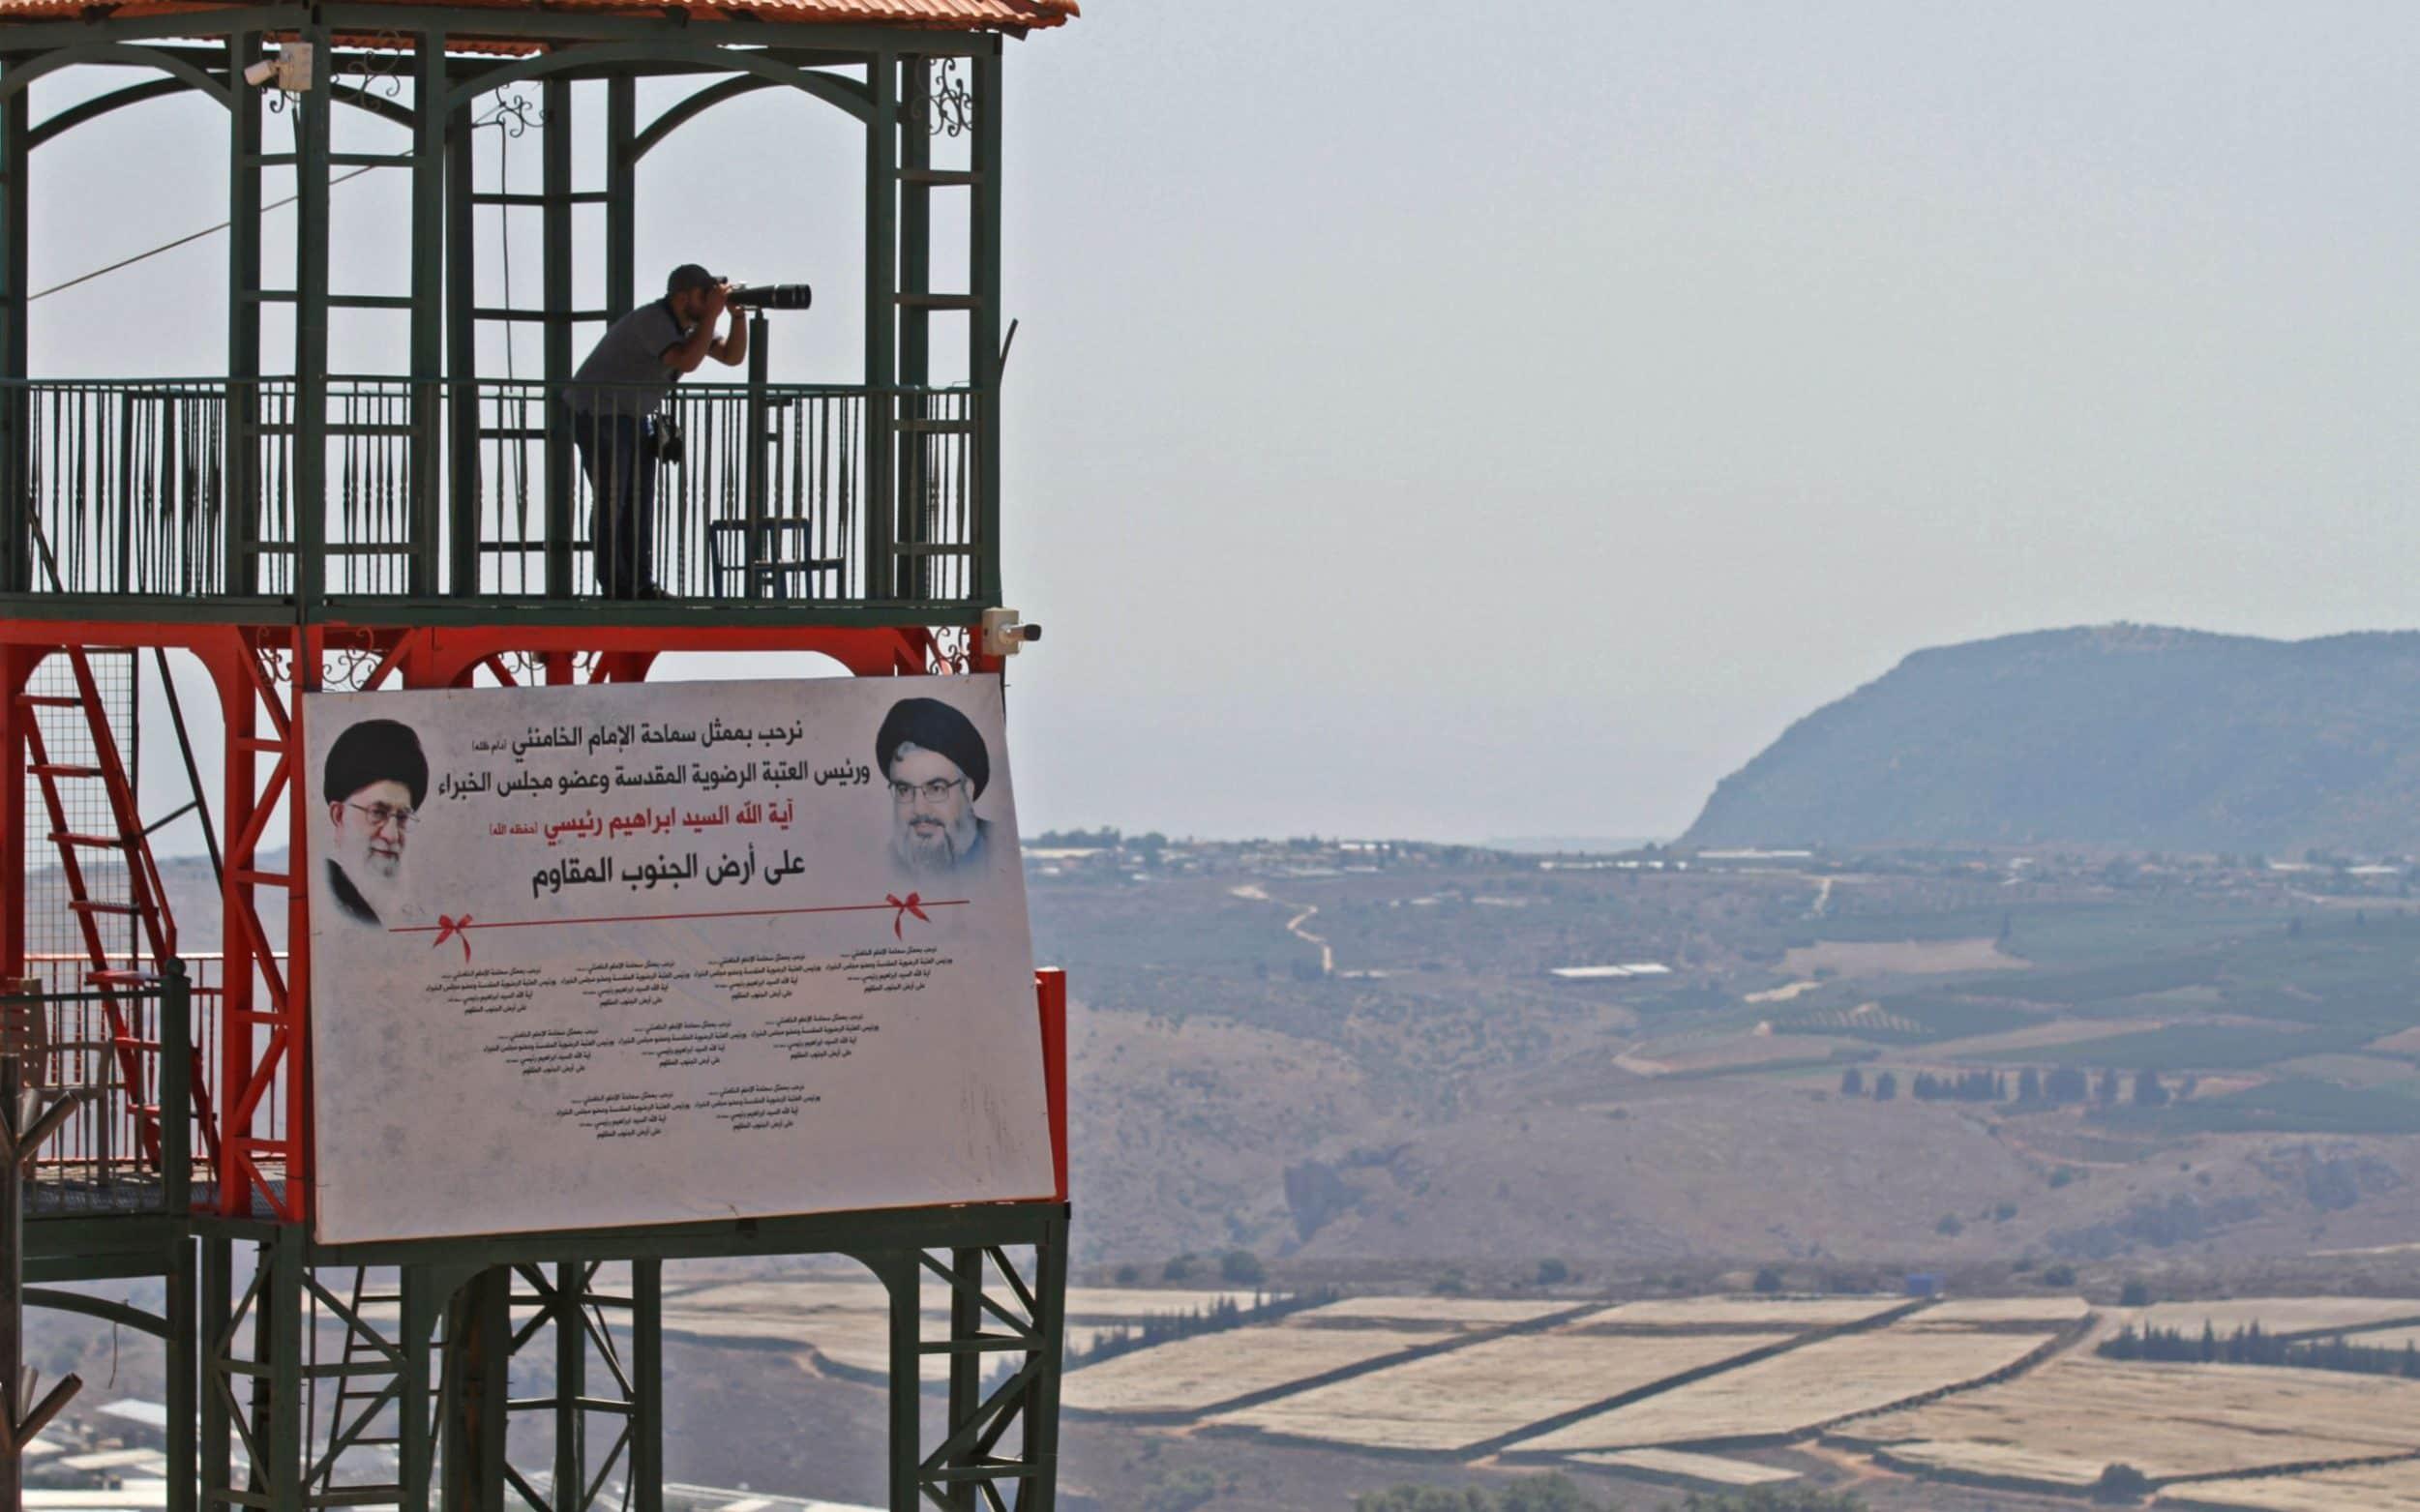 Hizbollah shoots down Israeli drone inside Lebanon amid rising tensions